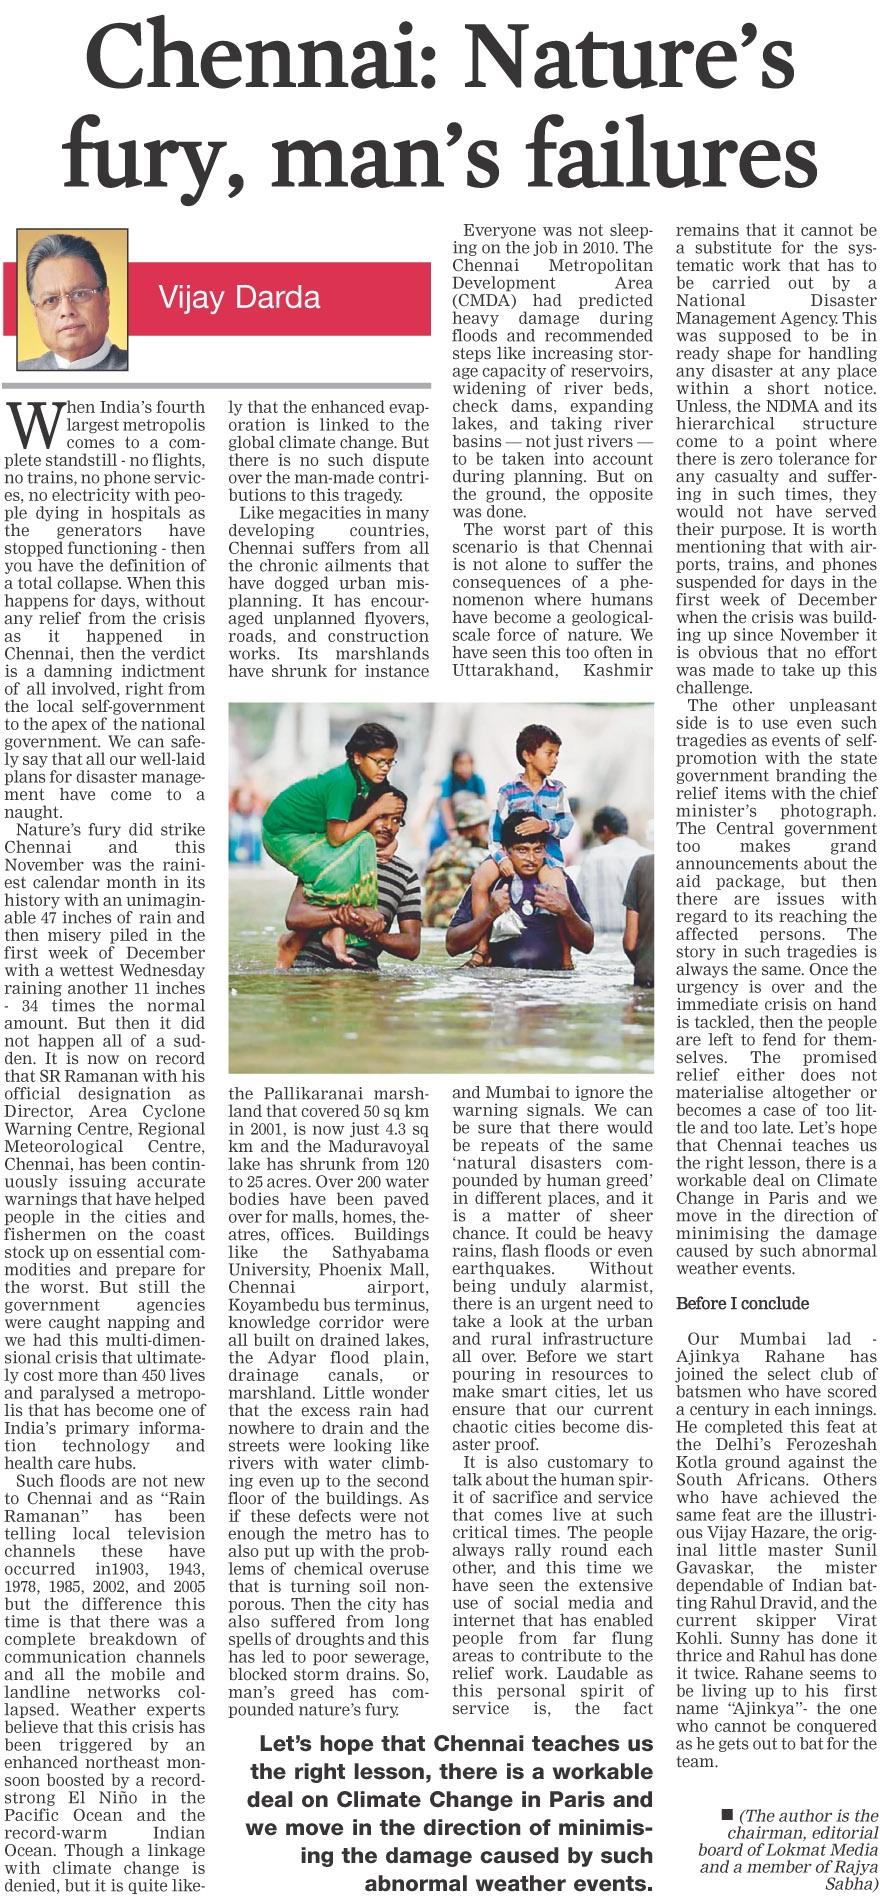 Chennai: Nature's fury, man's failures